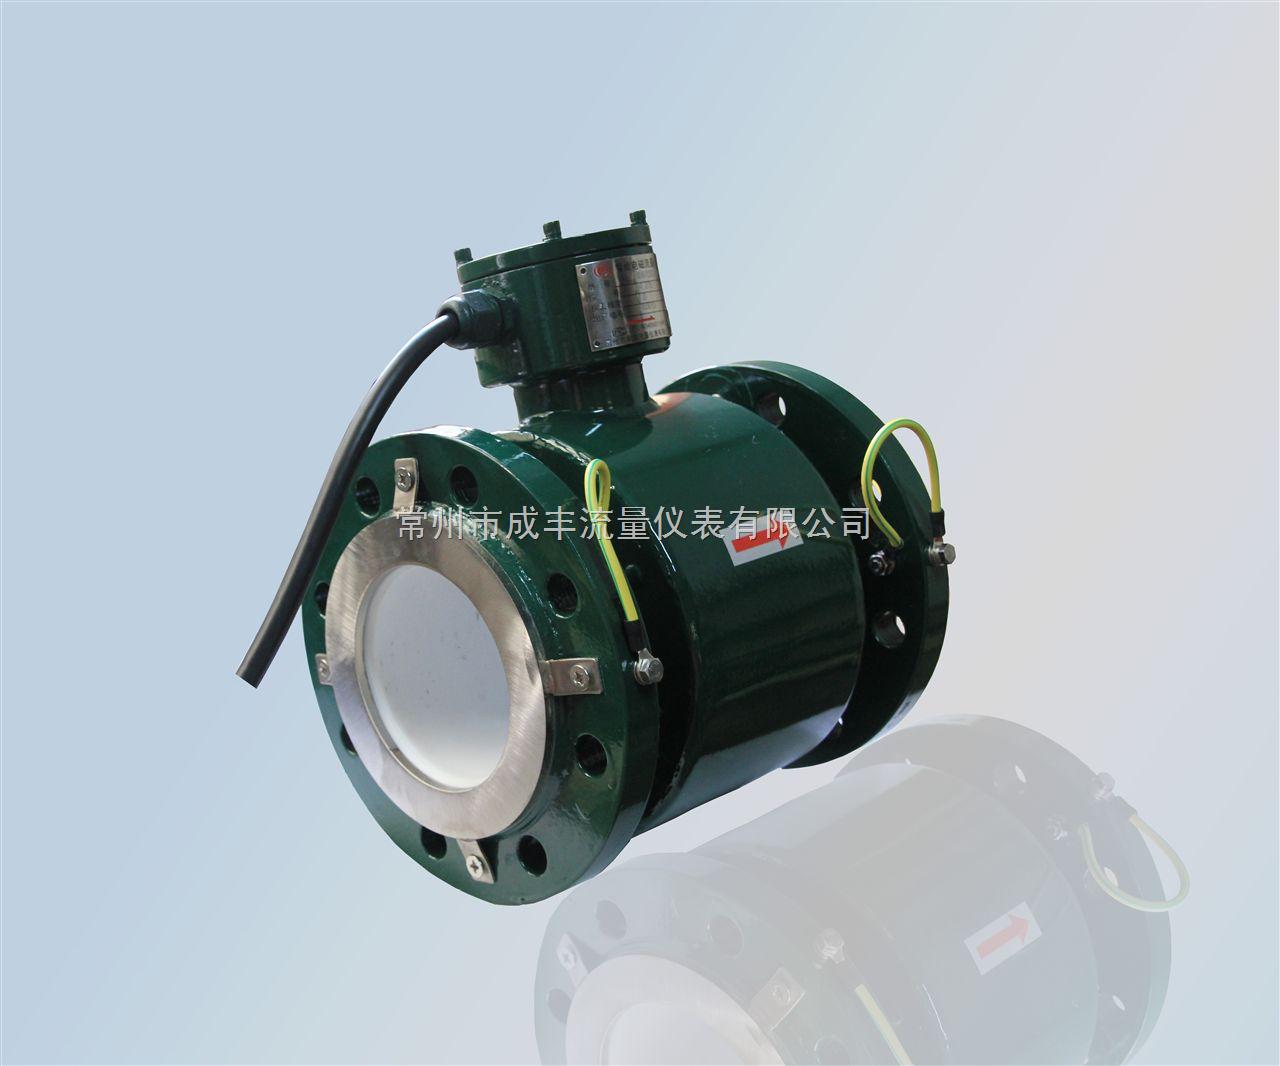 LDG-A150-测量泥浆的电磁流量计生产厂家【常州成丰】